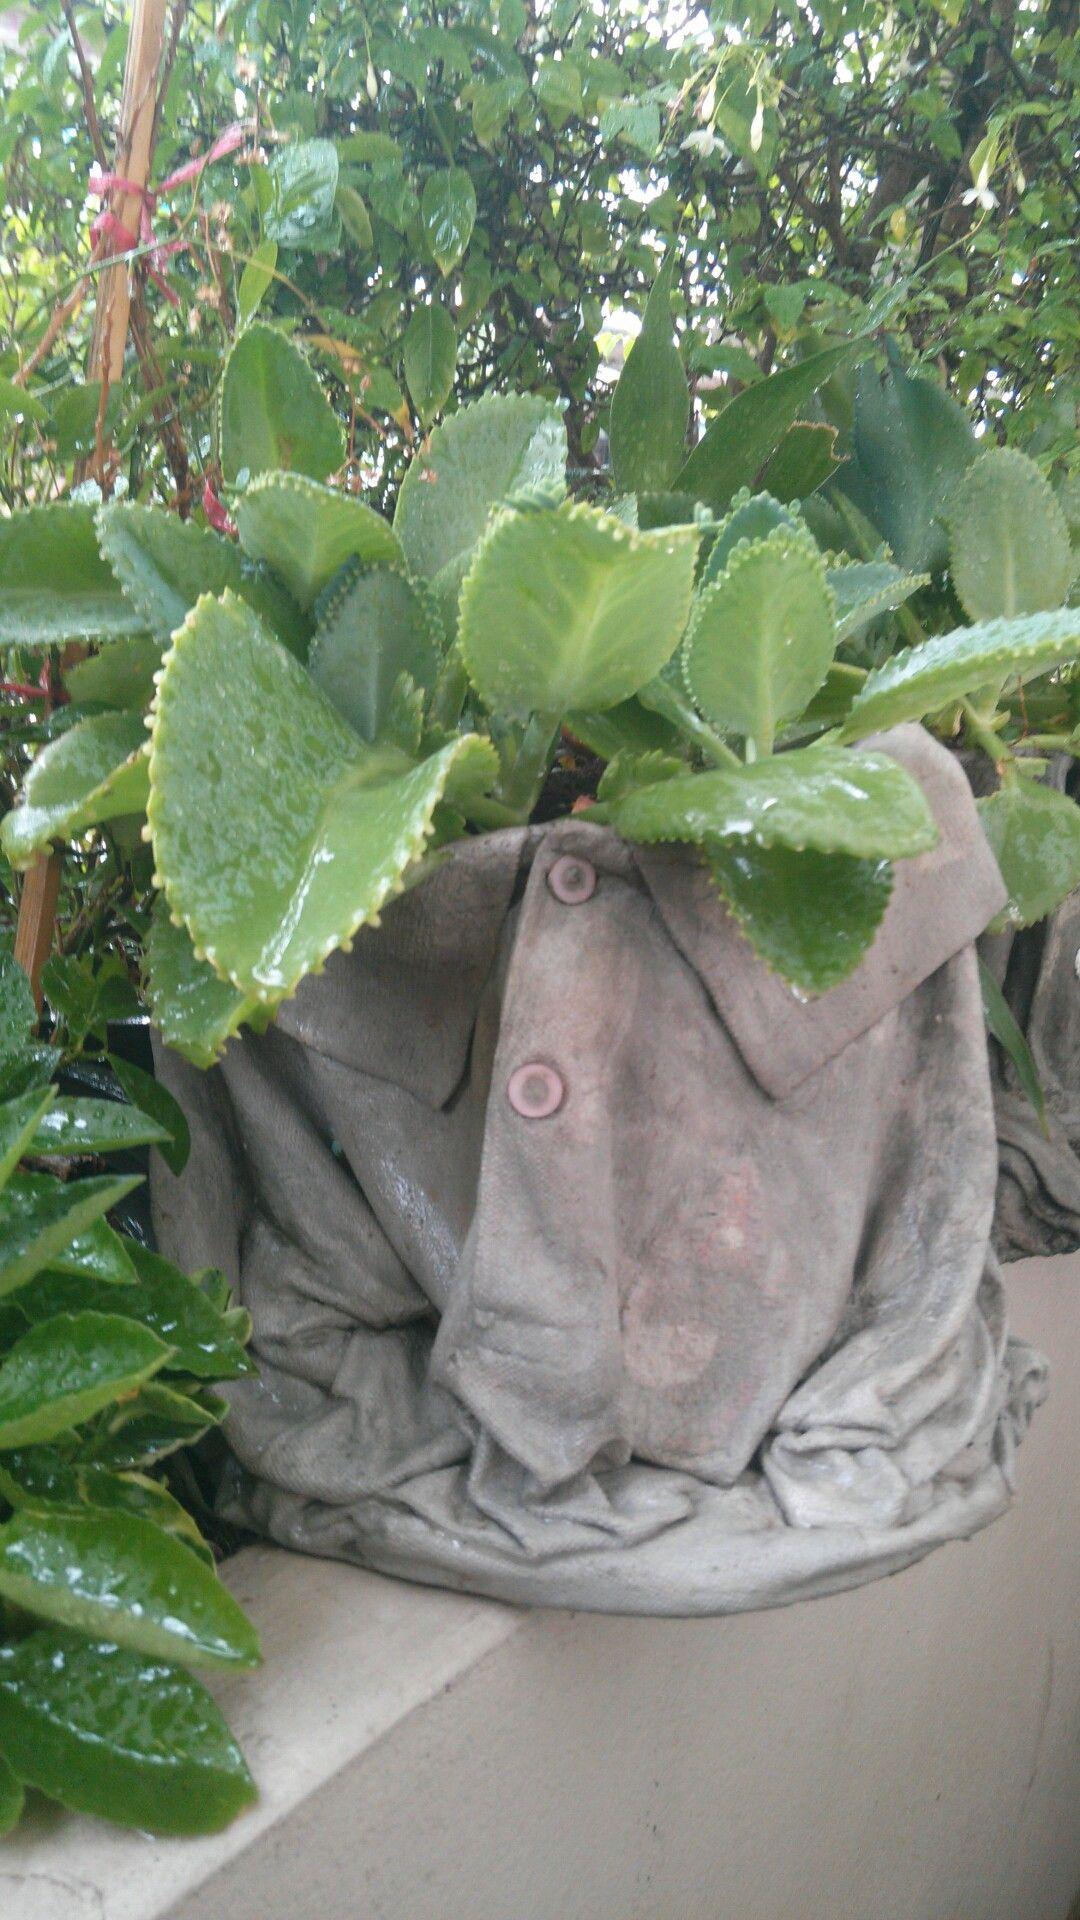 Fabric Cement Cement Flower Pots Cement Garden Concrete Garden